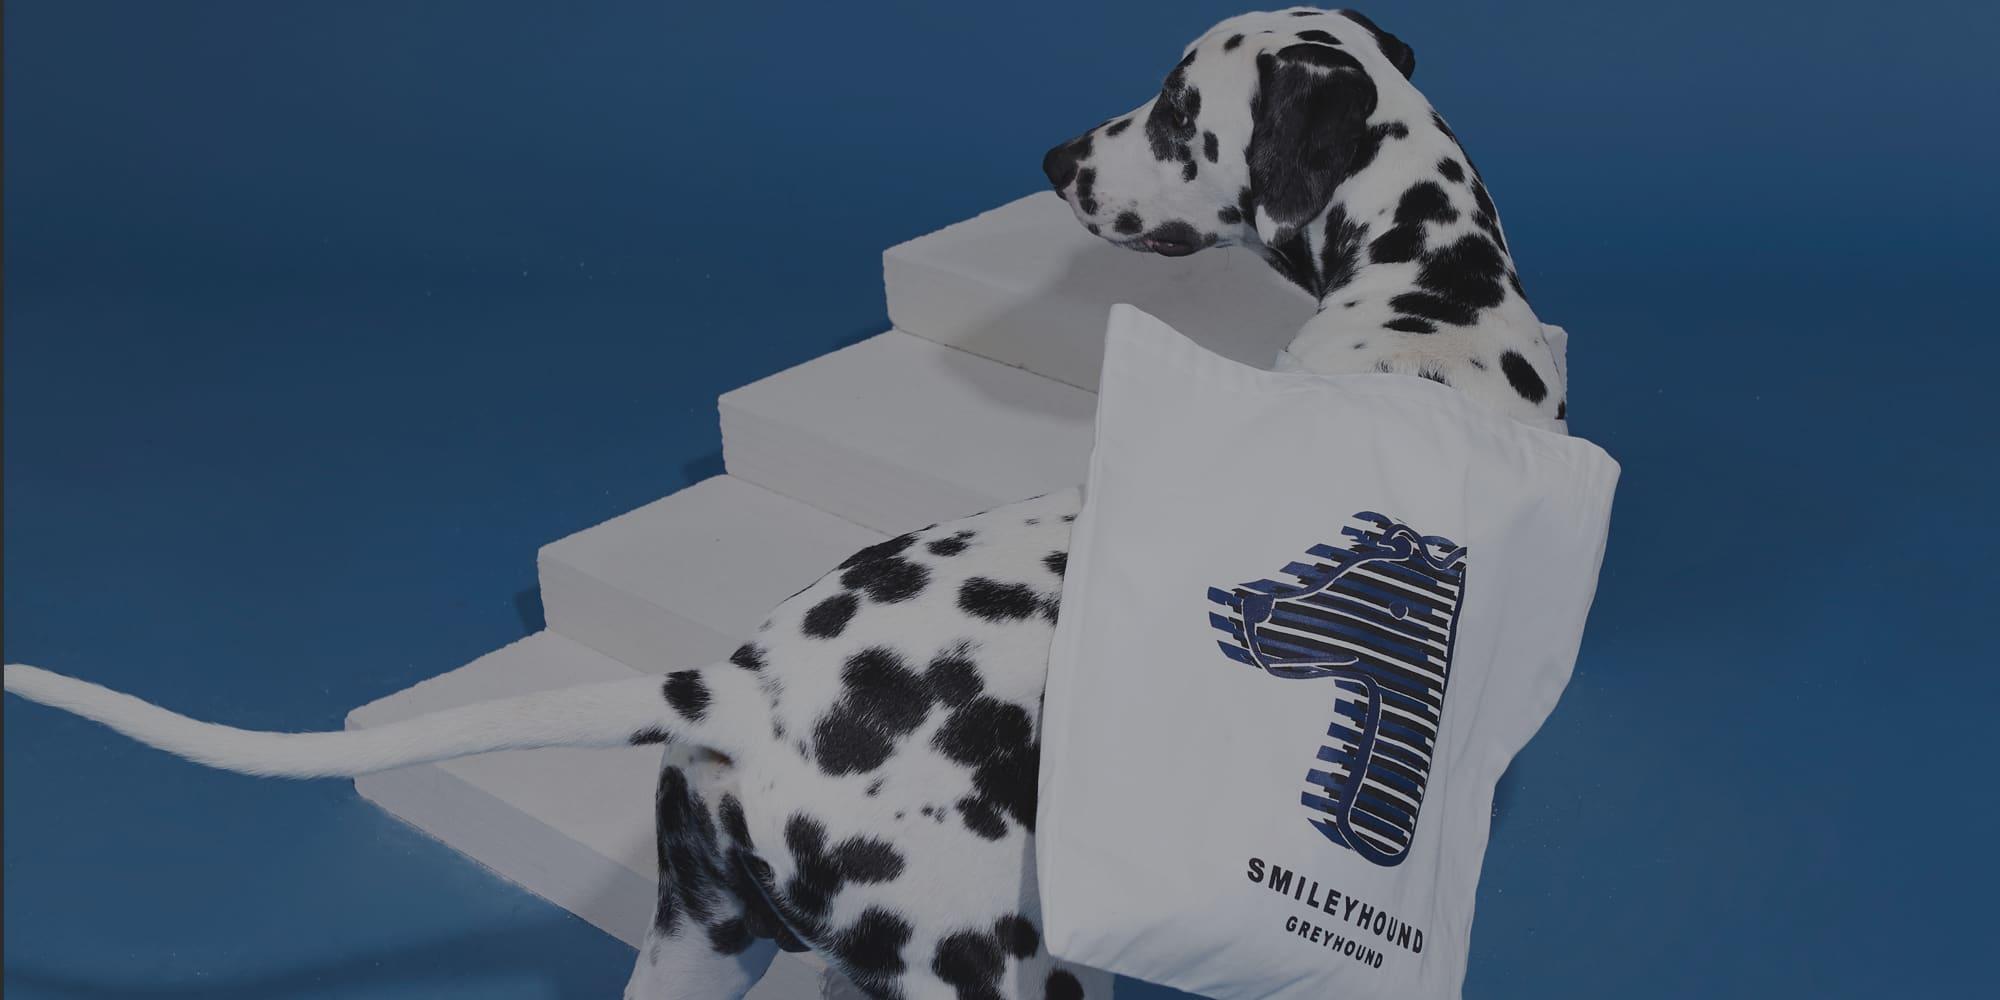 KOS Design - Smileyhound